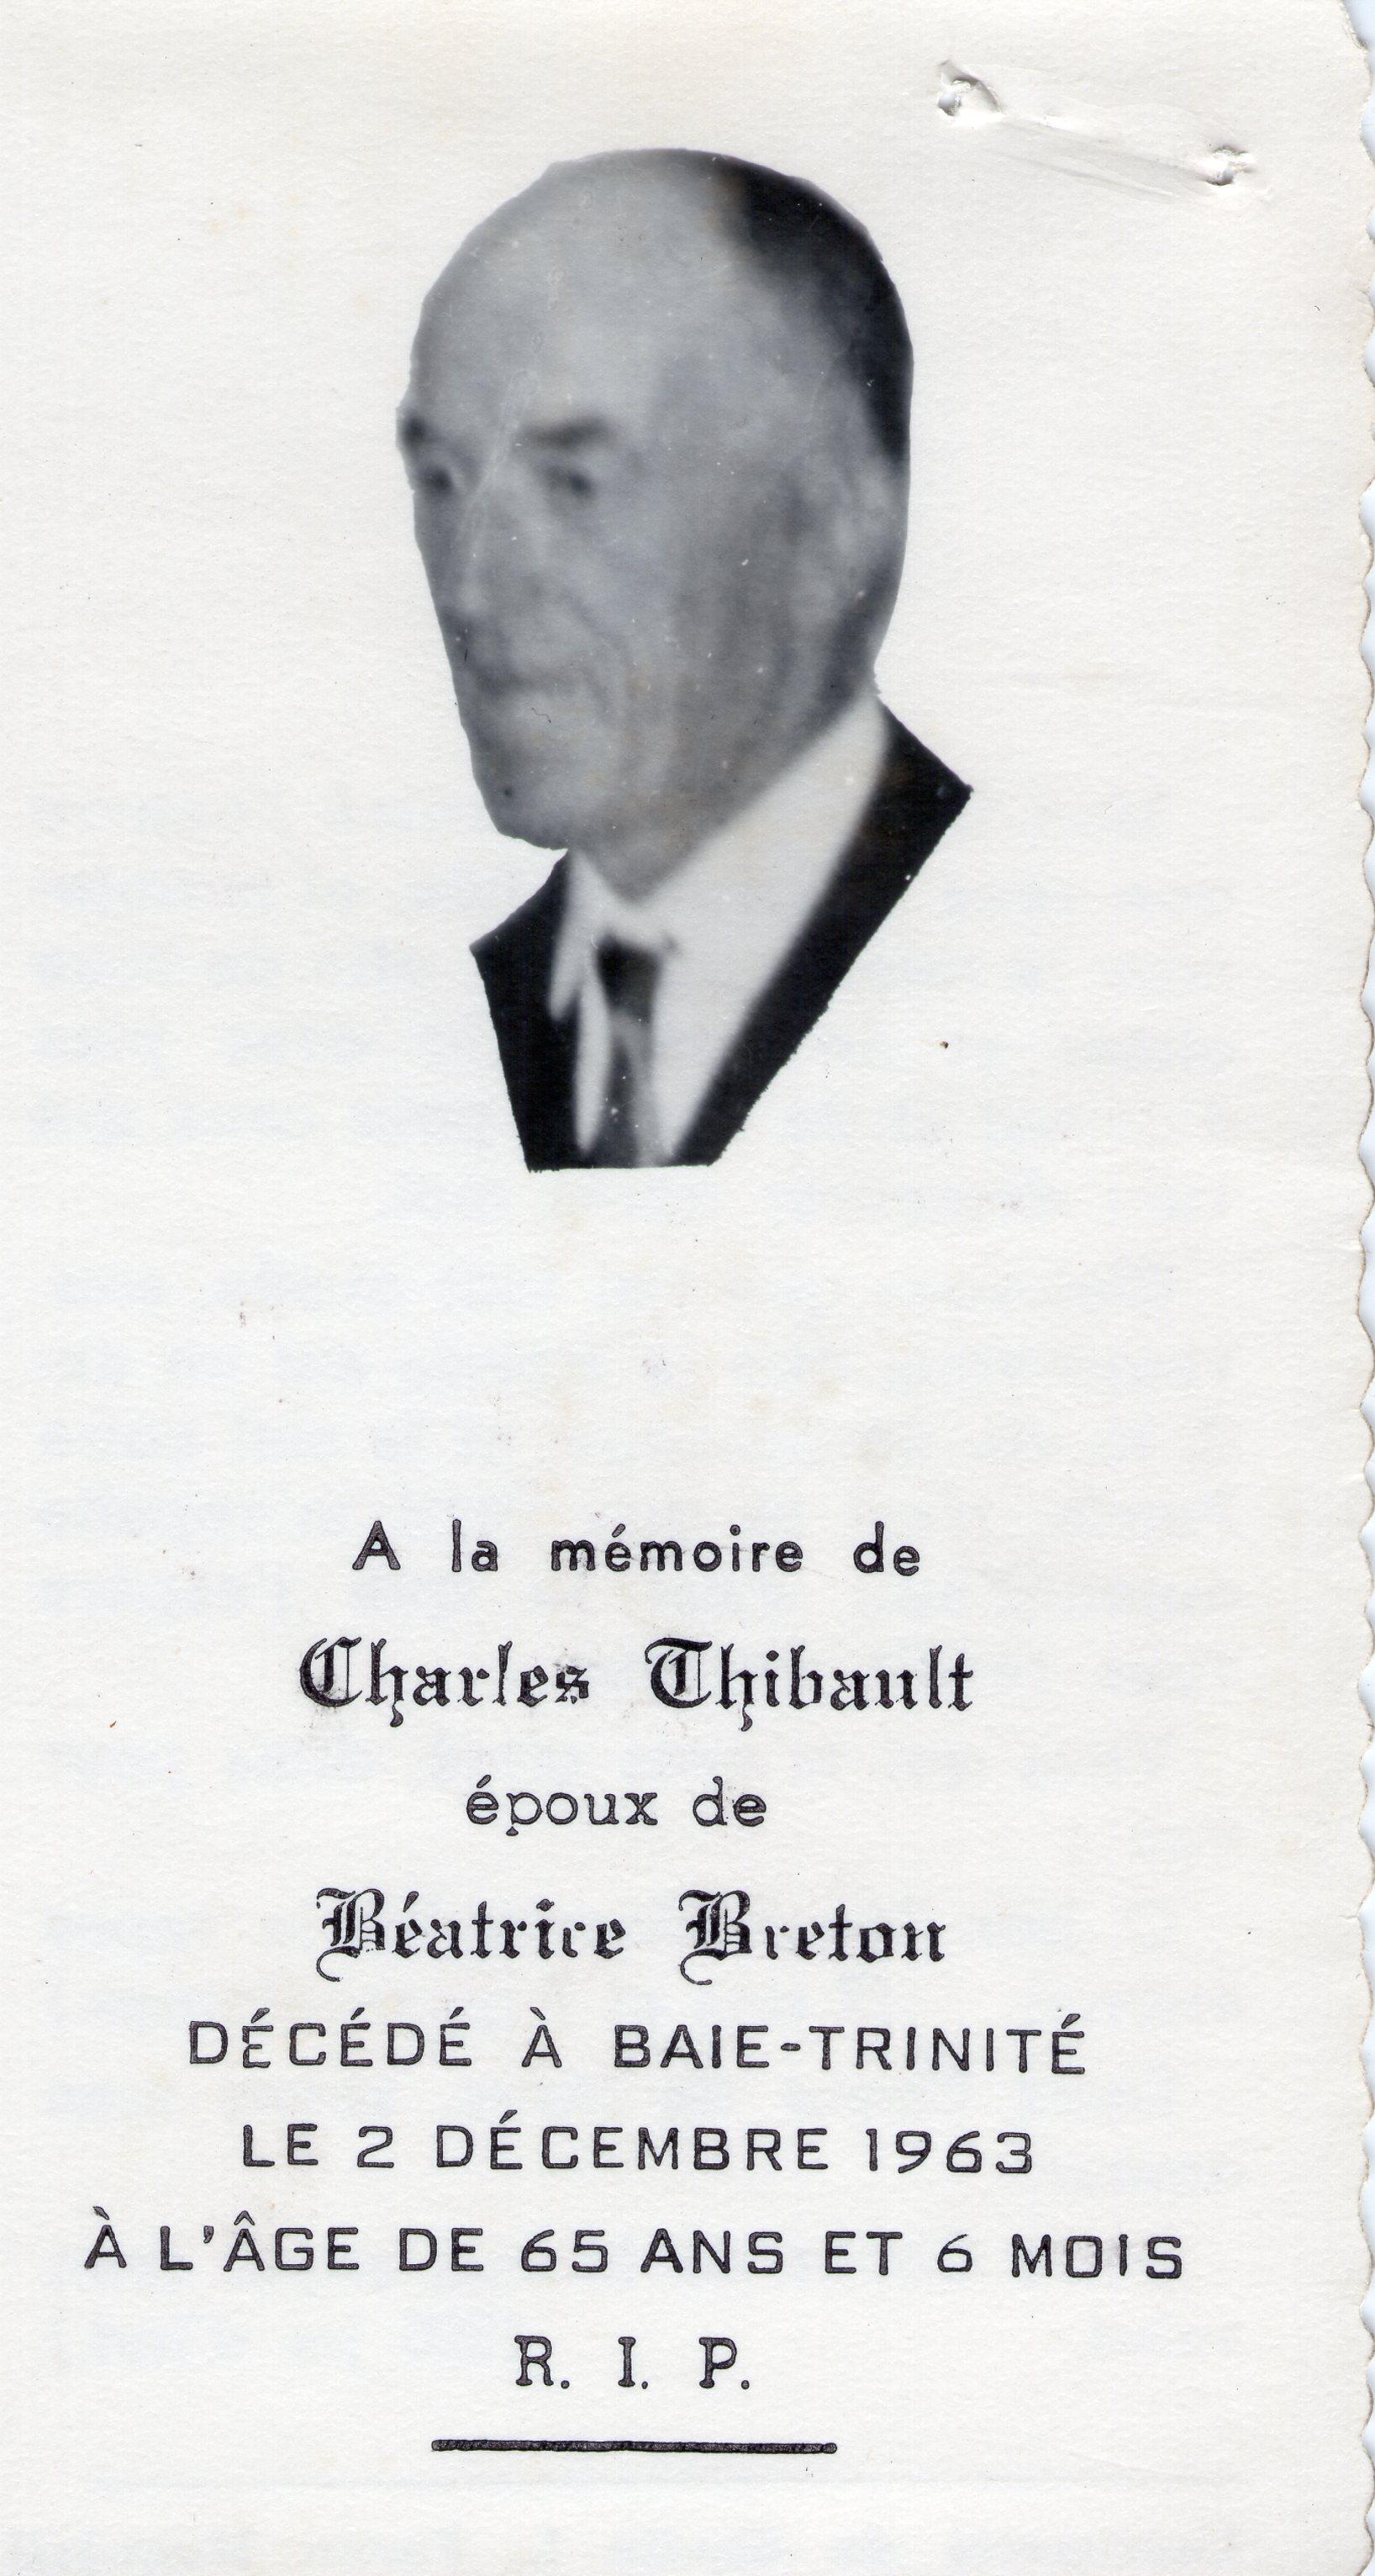 Charles Thibeault 1898-1963